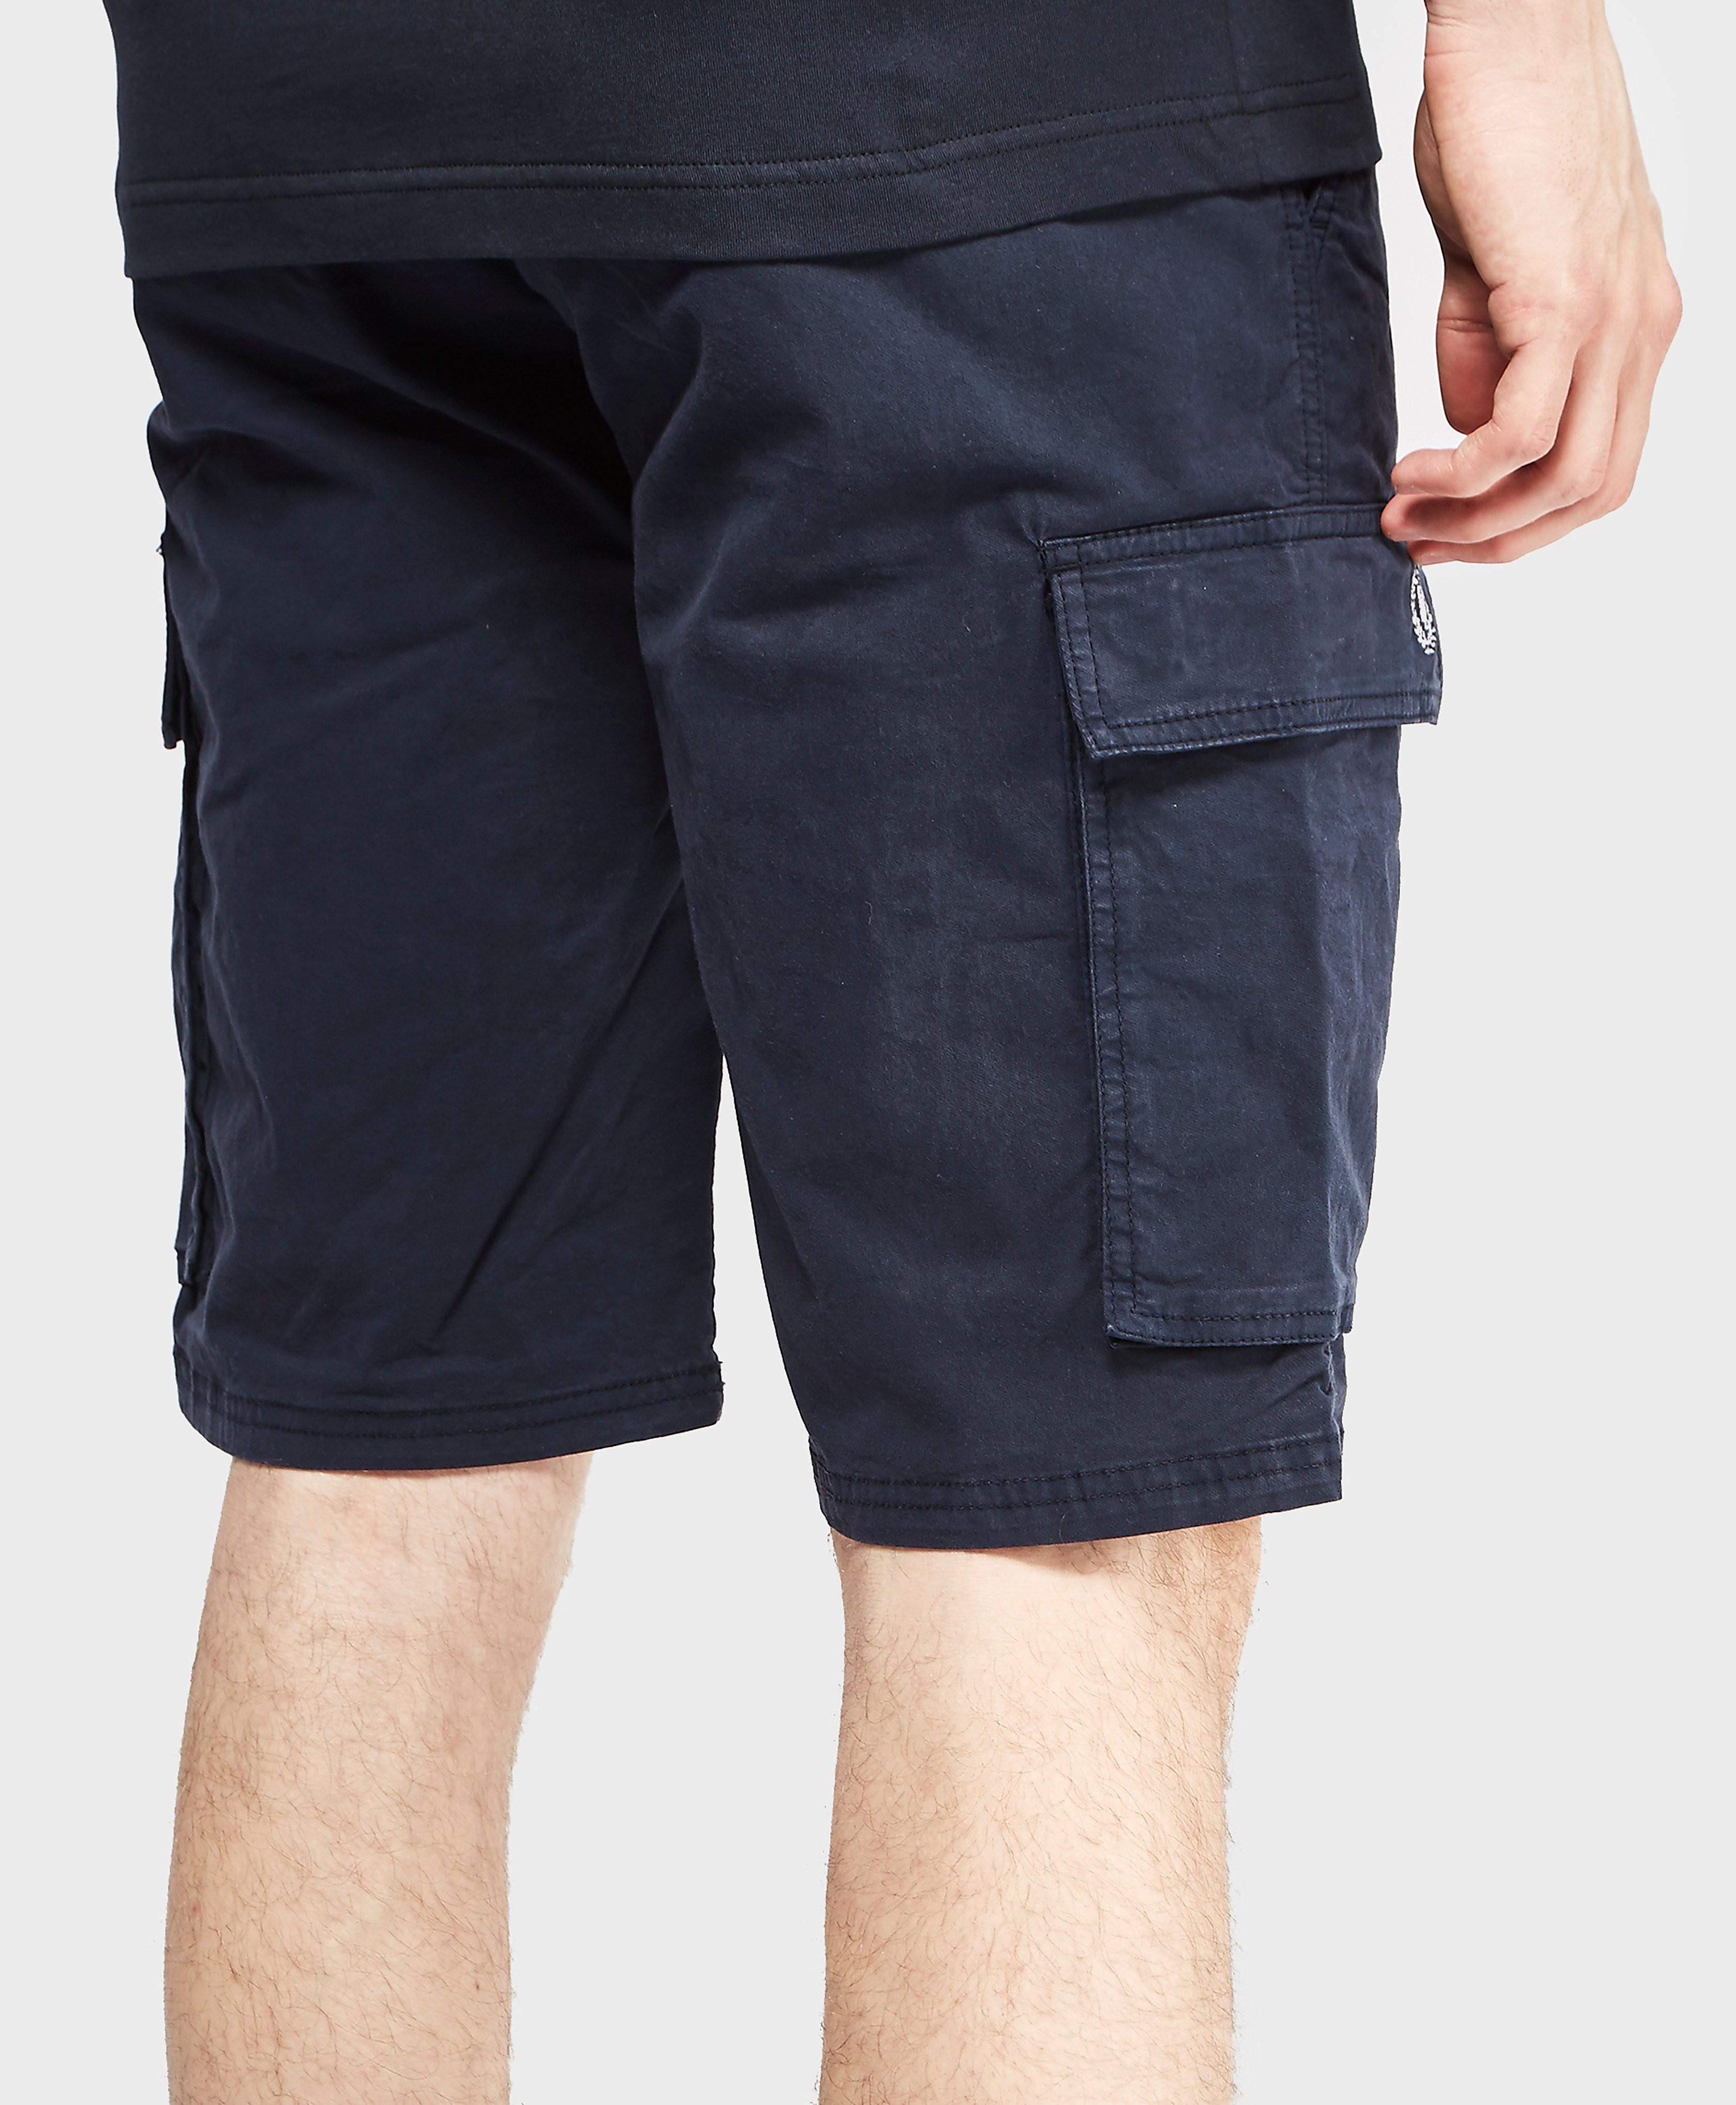 Henri Lloyd Cargo Shorts